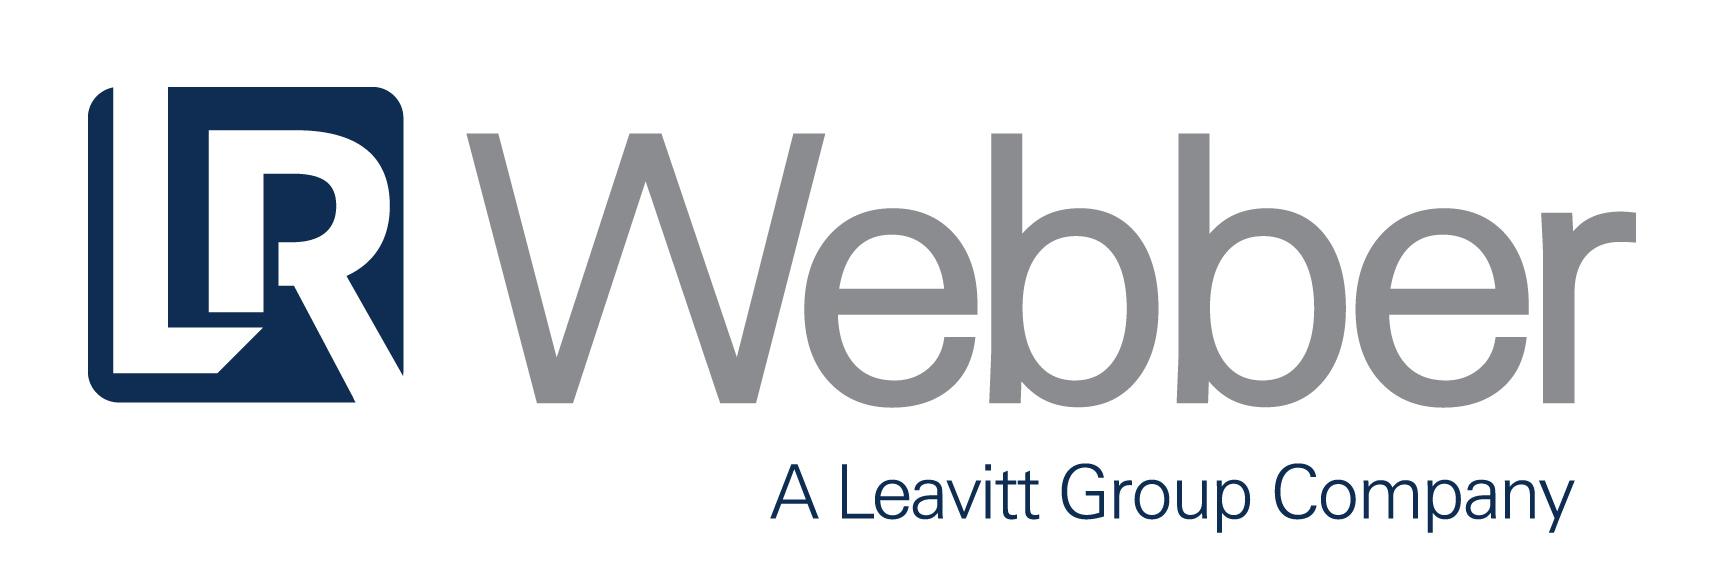 L.R. Webber Associates, Inc.